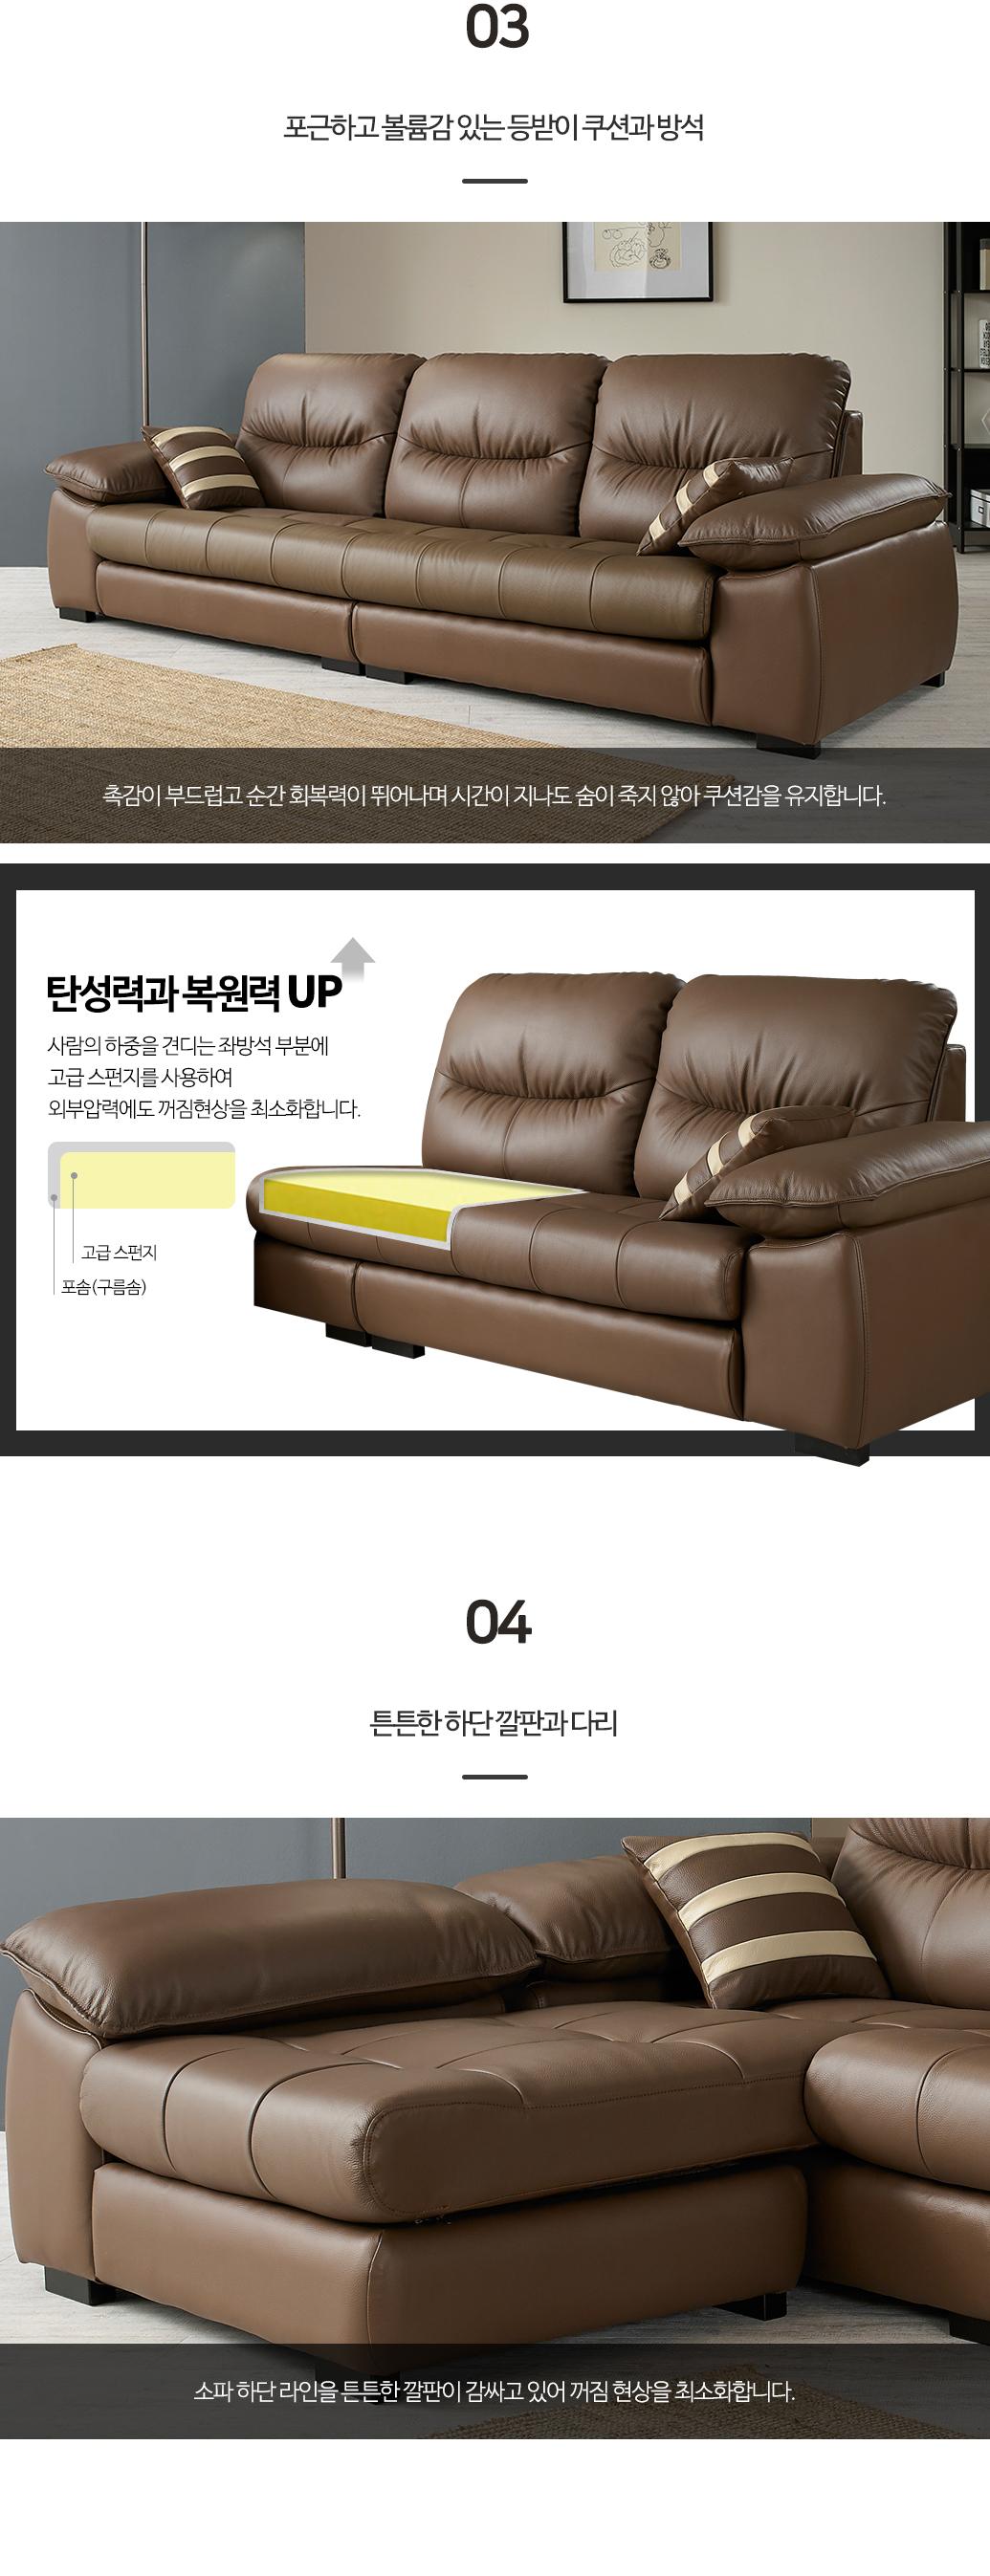 gr_oprah_couch06.jpg